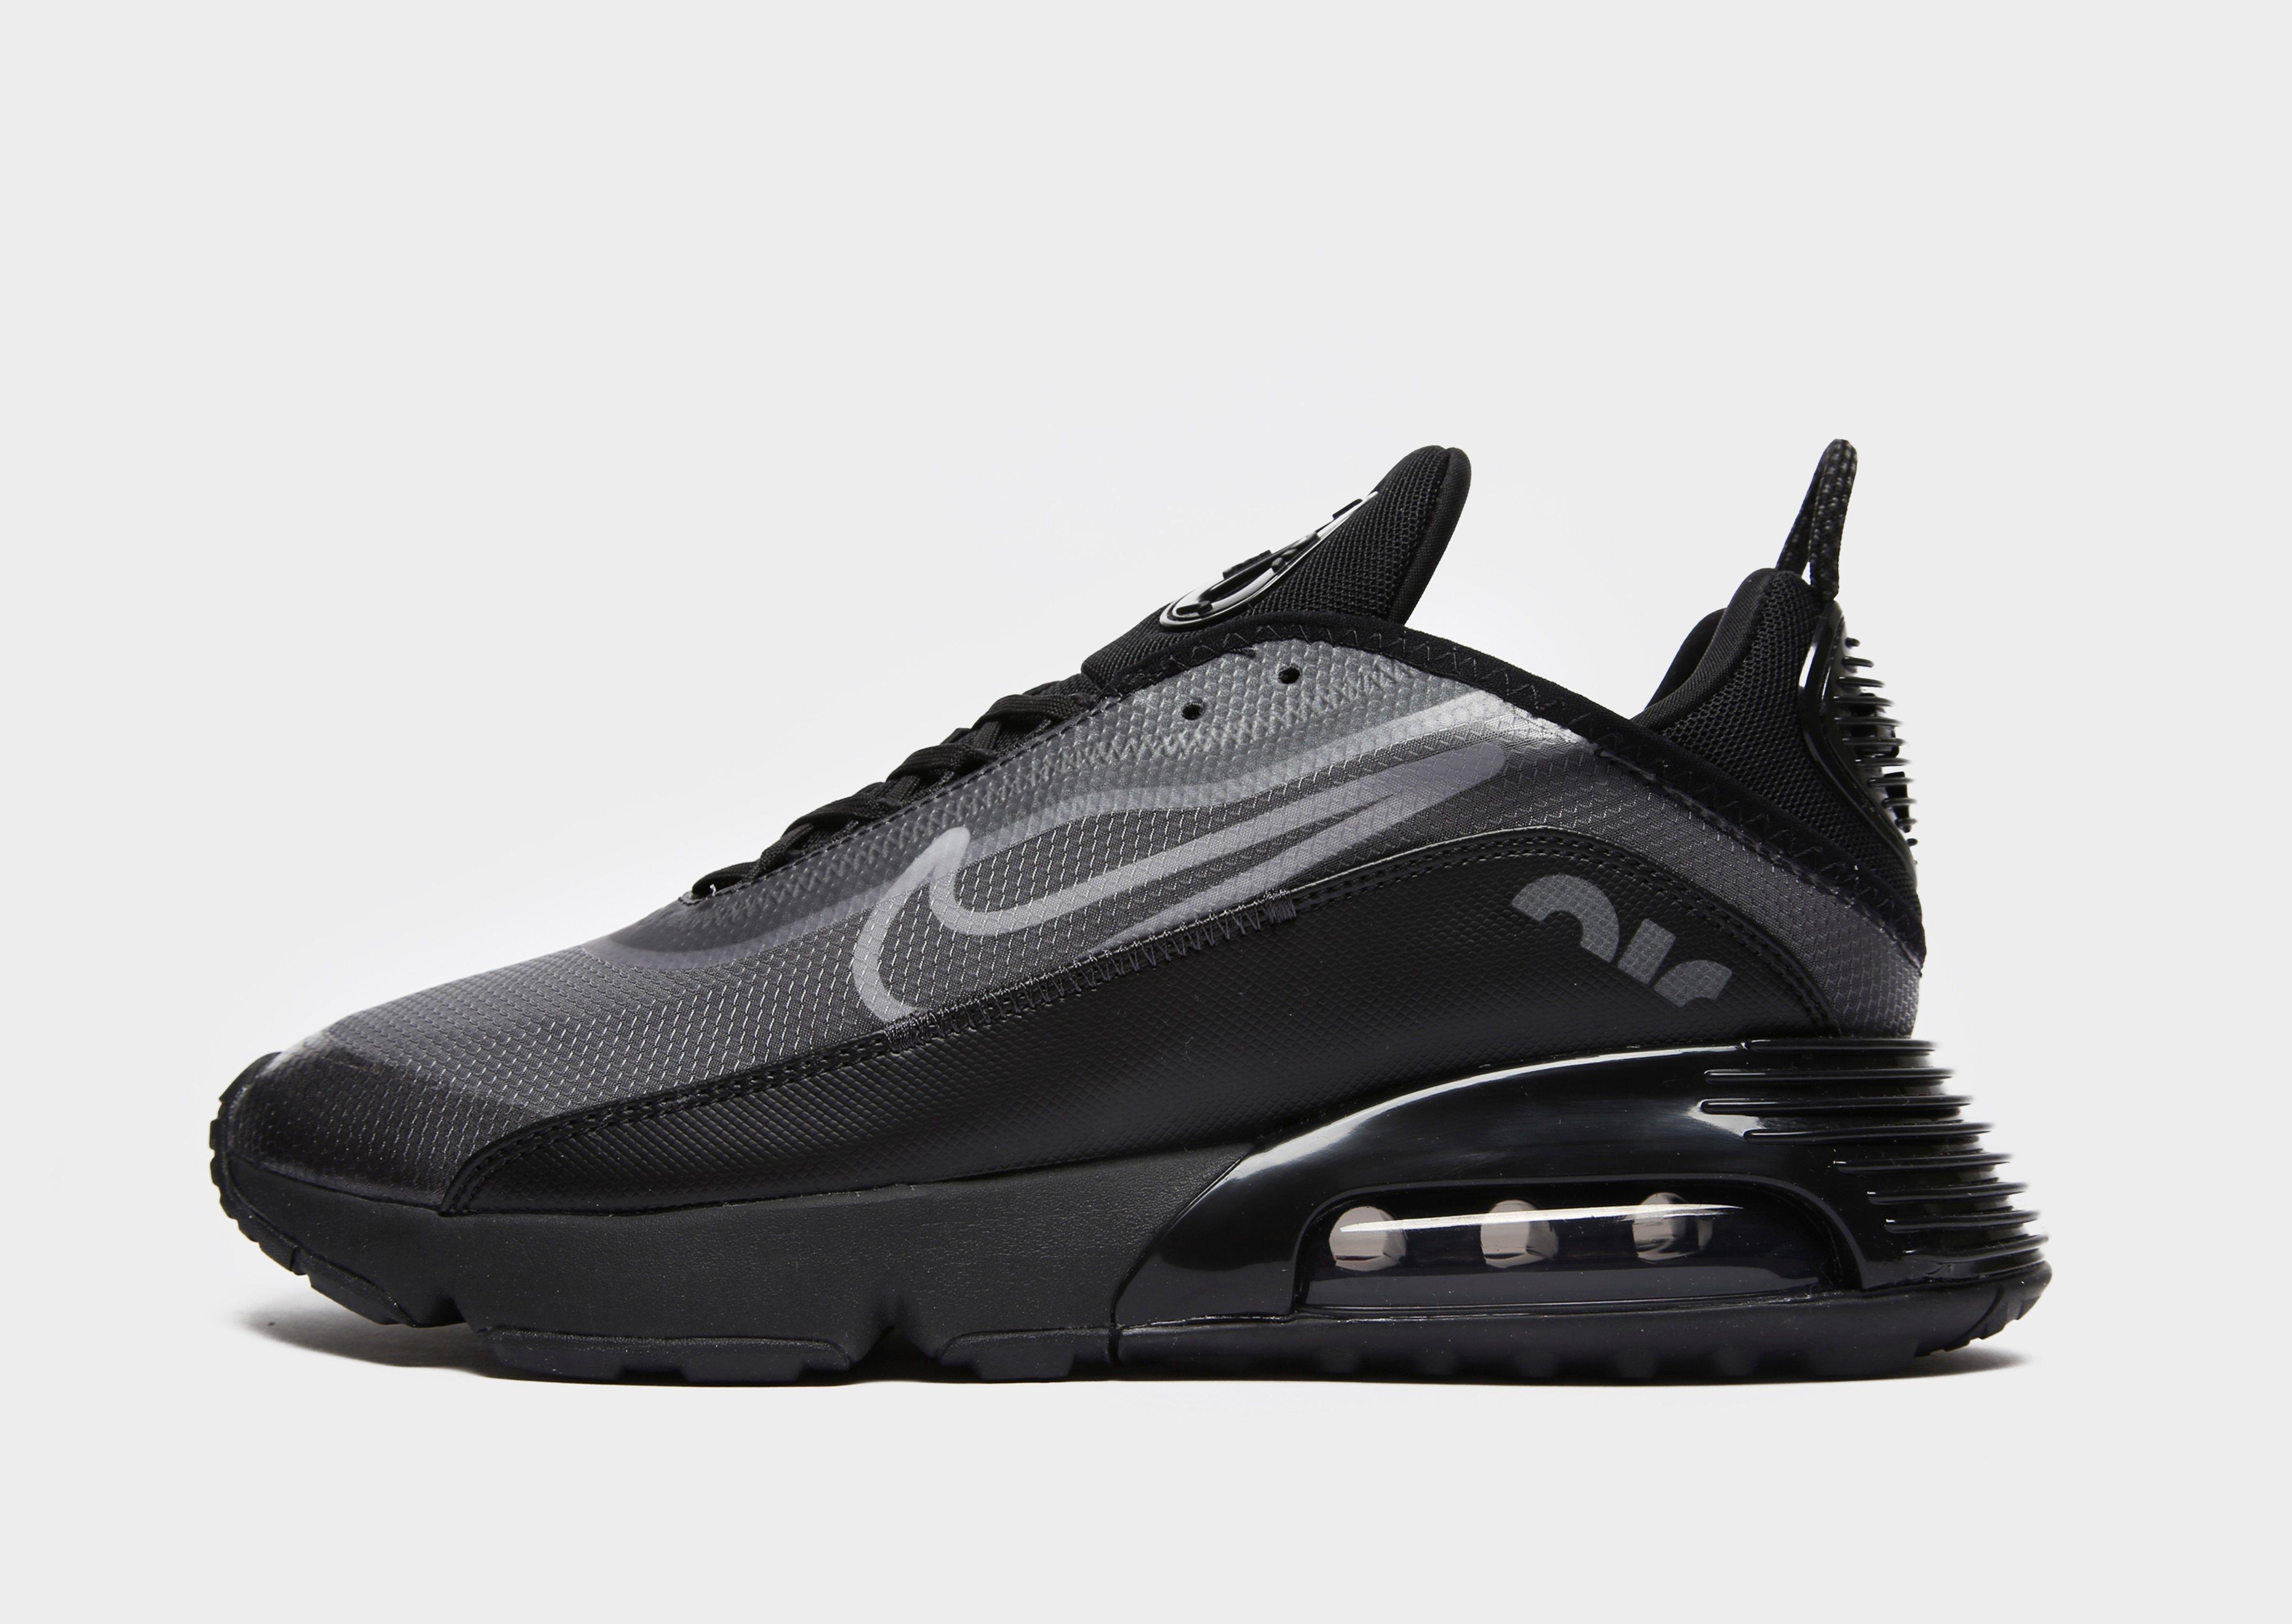 NIKE AIR MAX 2090 DONNA Tutte Sneaker Scarpe